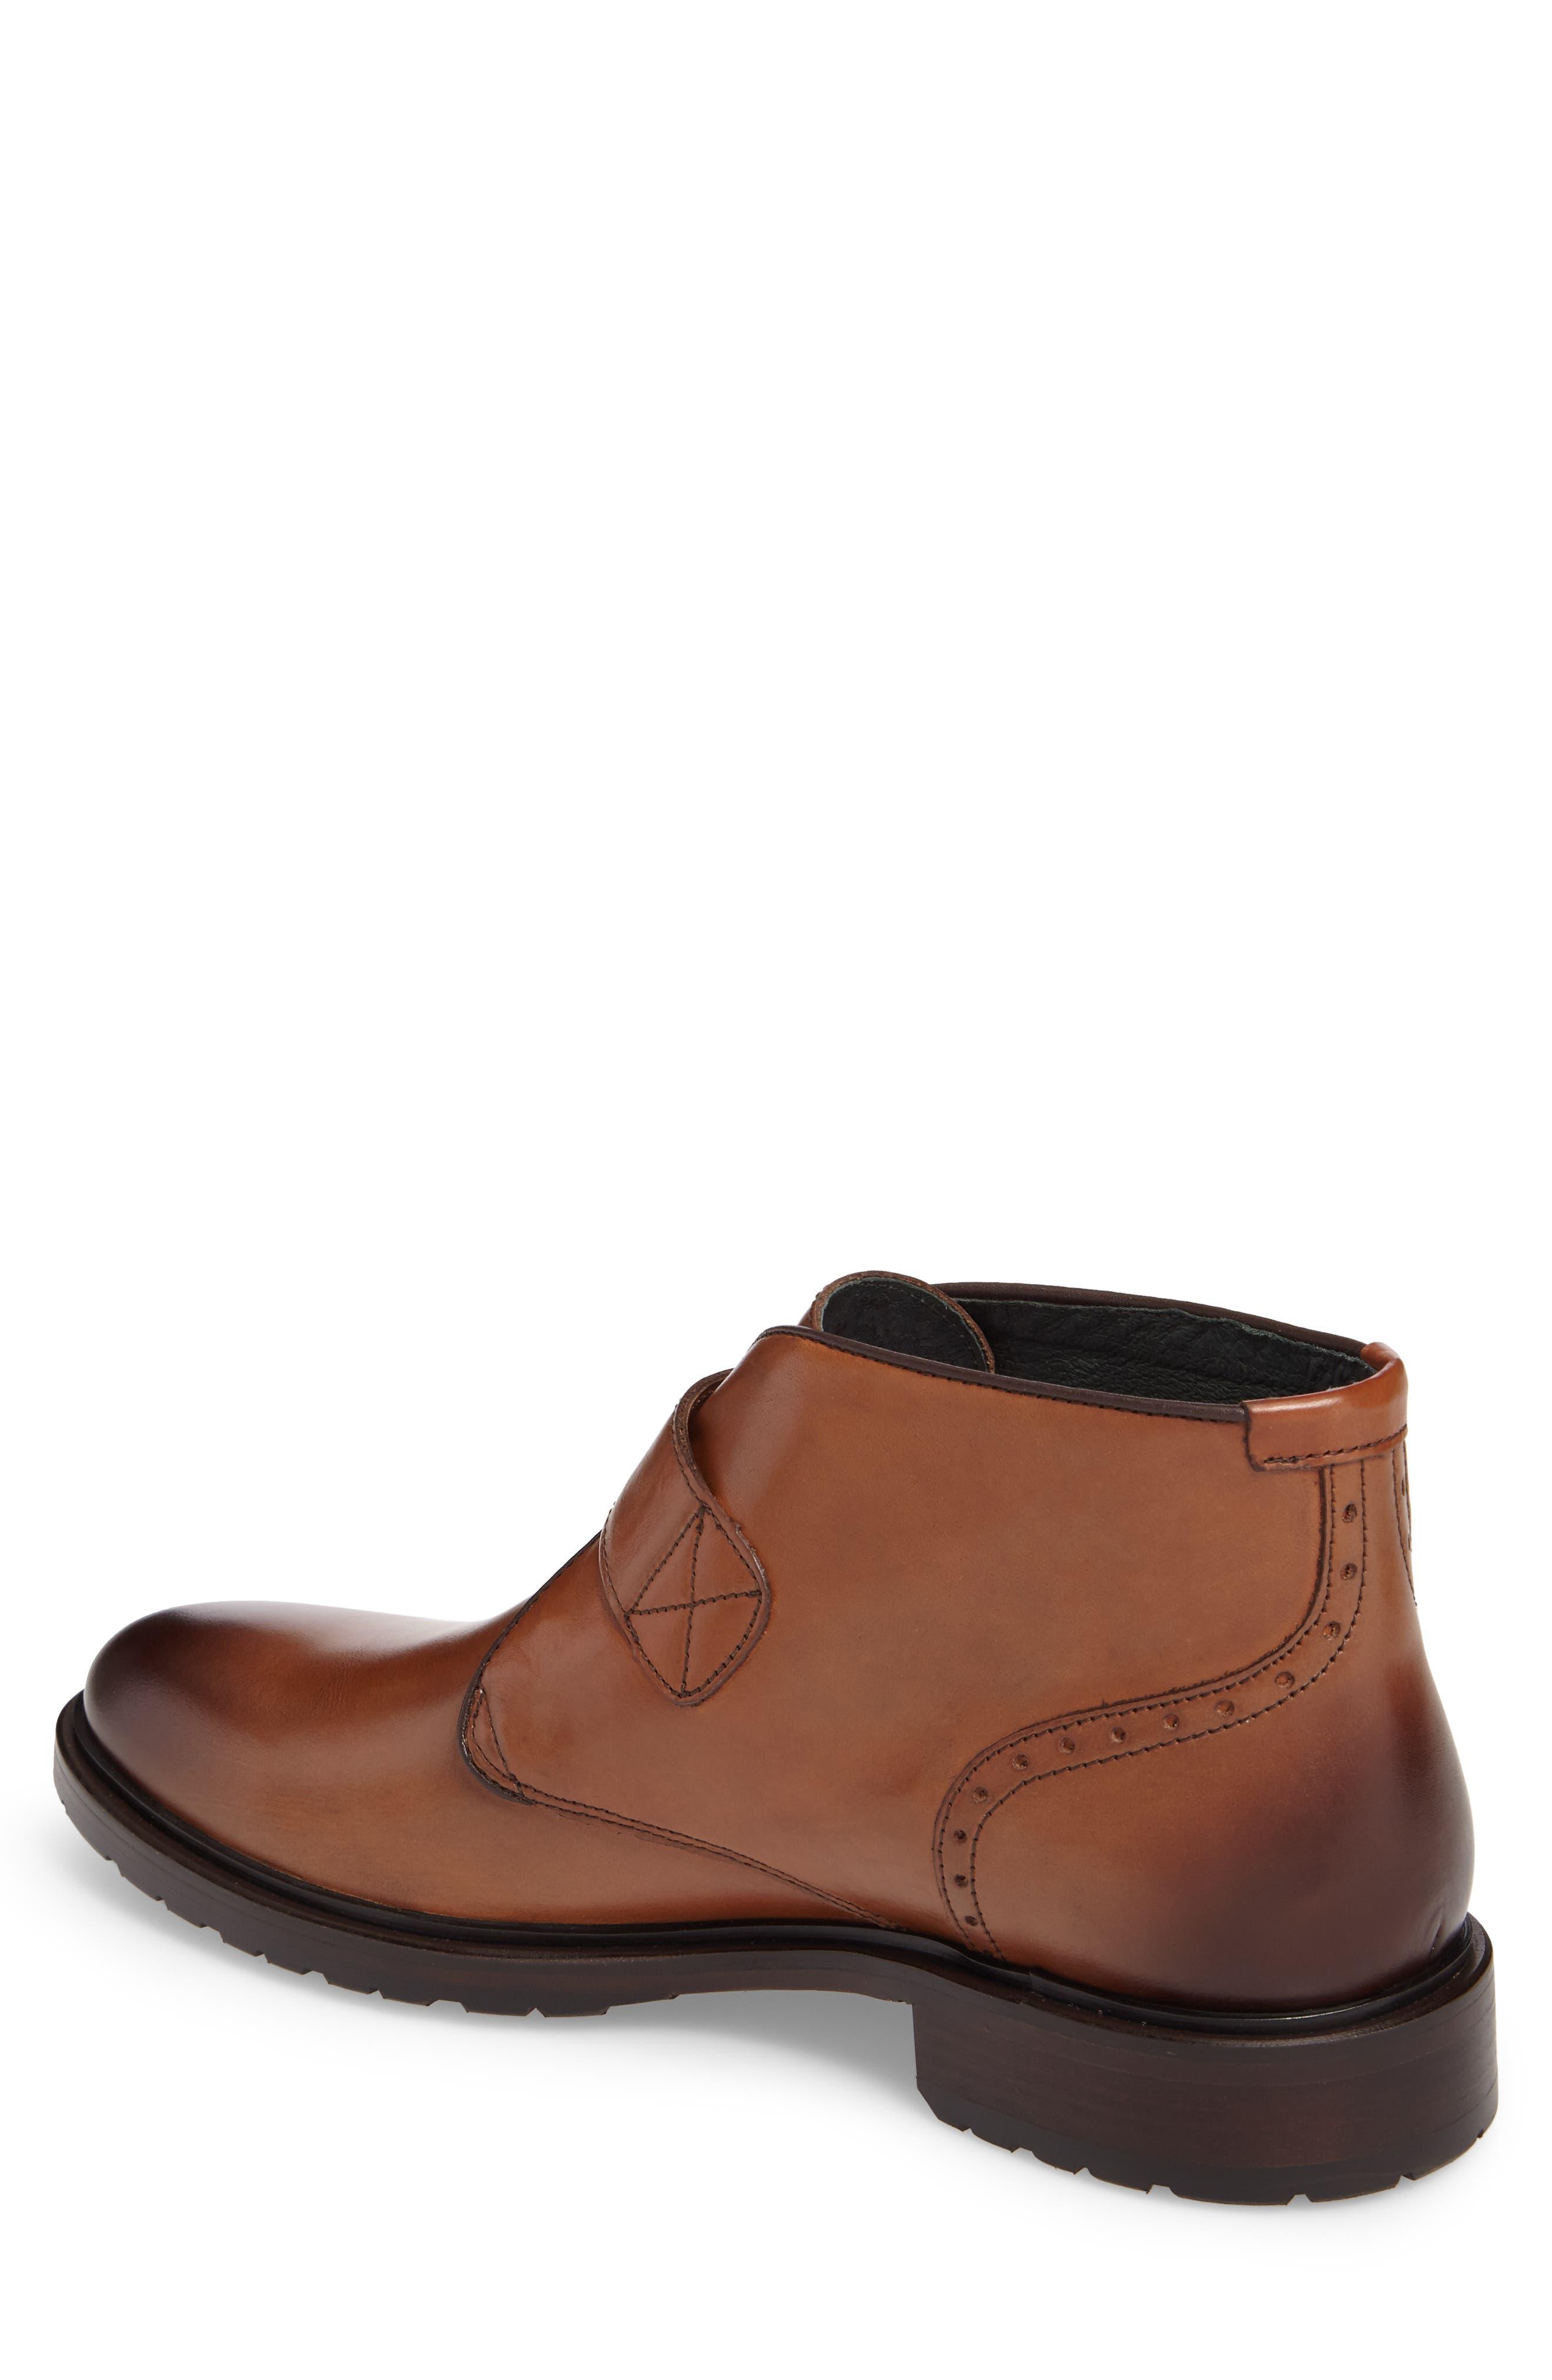 Alternate Image 2  - J&M 1850 Myles Monk Strap Boot (Men)